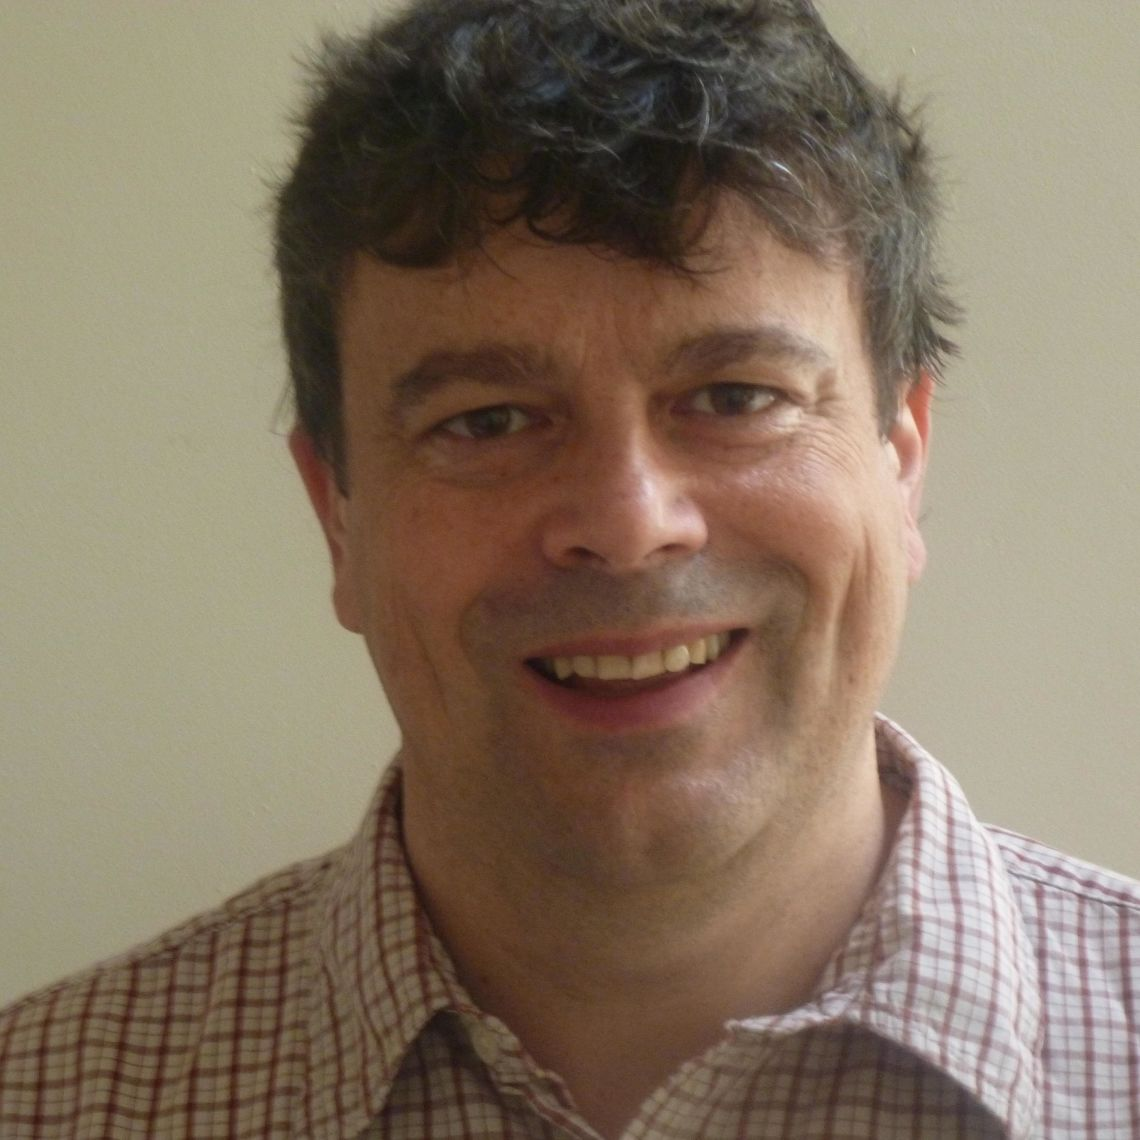 Ian Tomlison